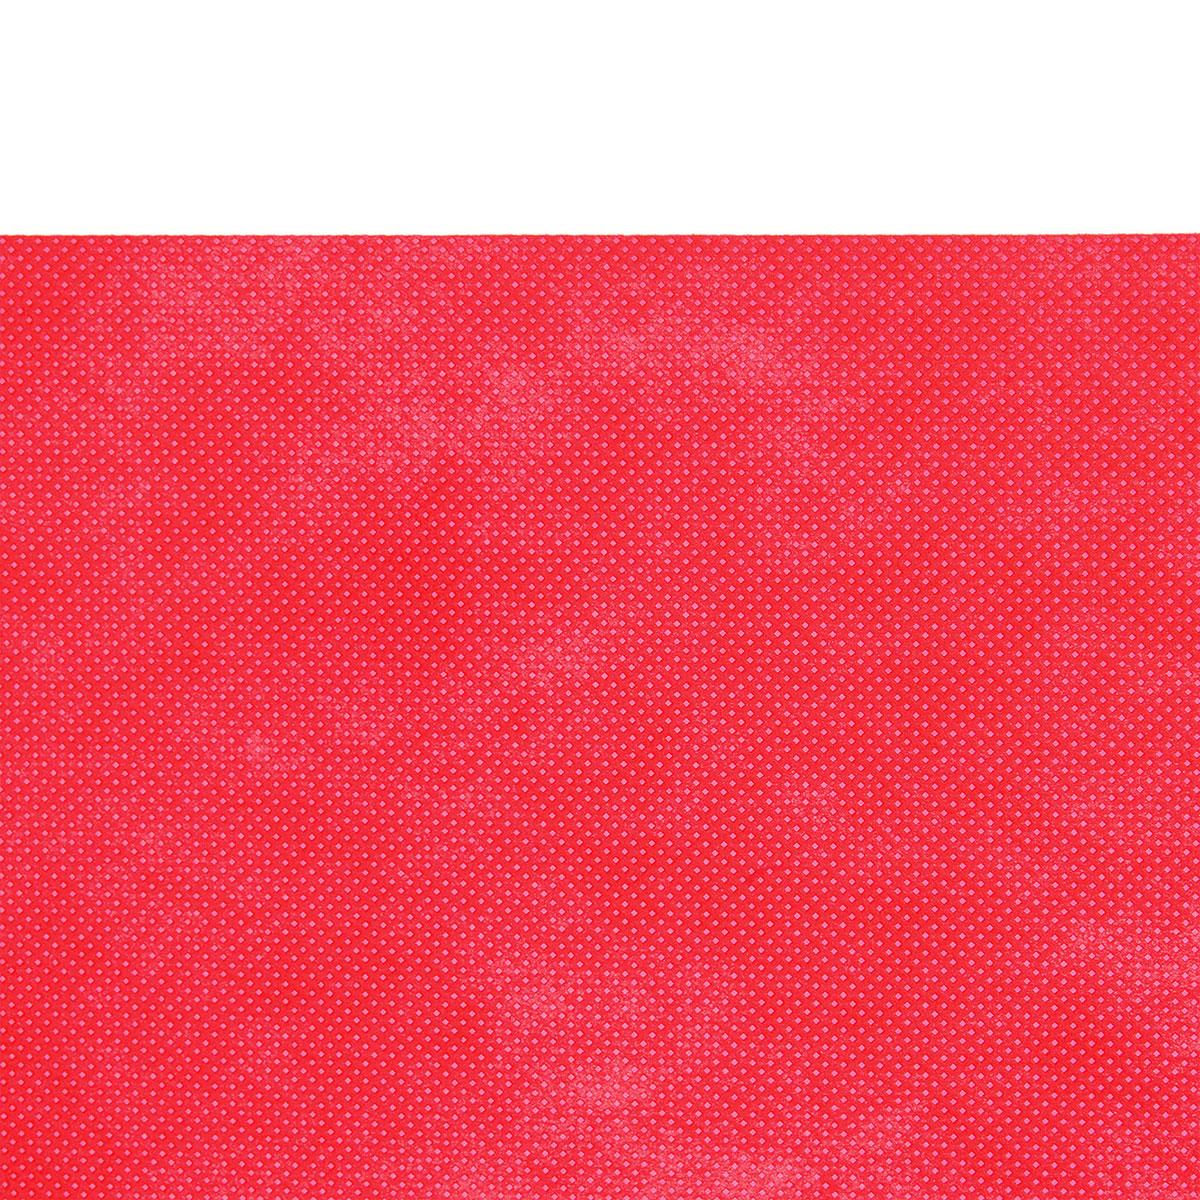 dekovlies in 1 6m breite rot meterware dekostoff vlies. Black Bedroom Furniture Sets. Home Design Ideas